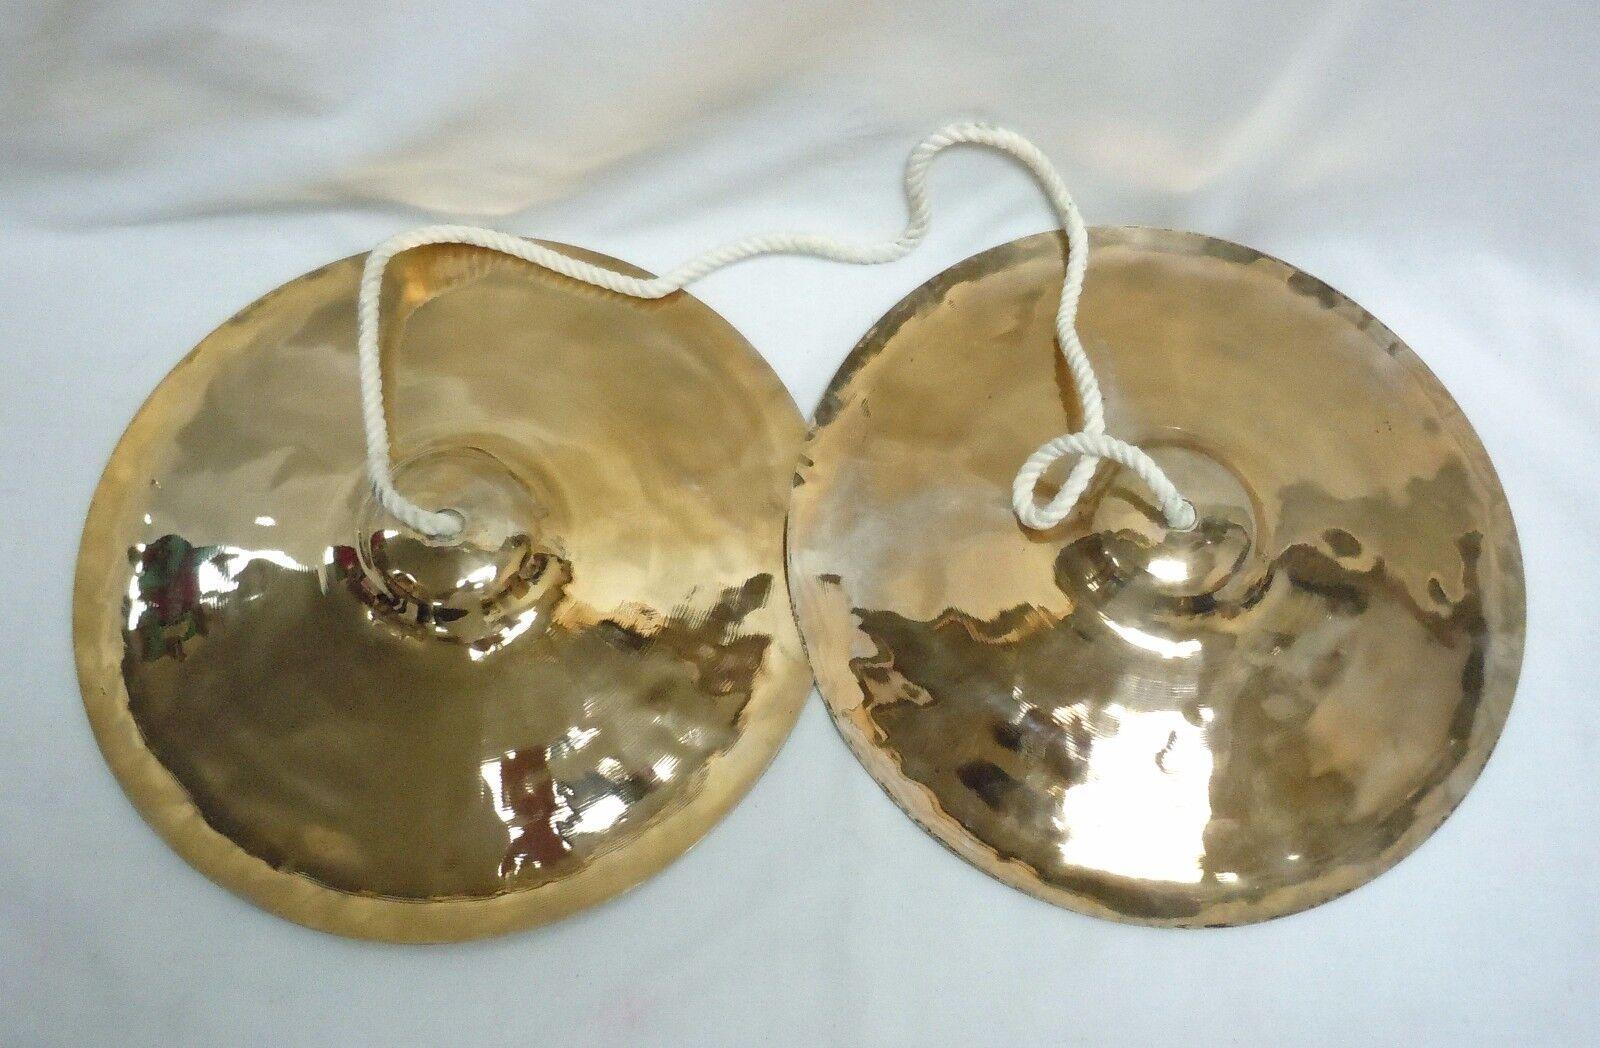 Korean Buddhist Brass Cymbals - Barra, Great Sound, Made In South Korea